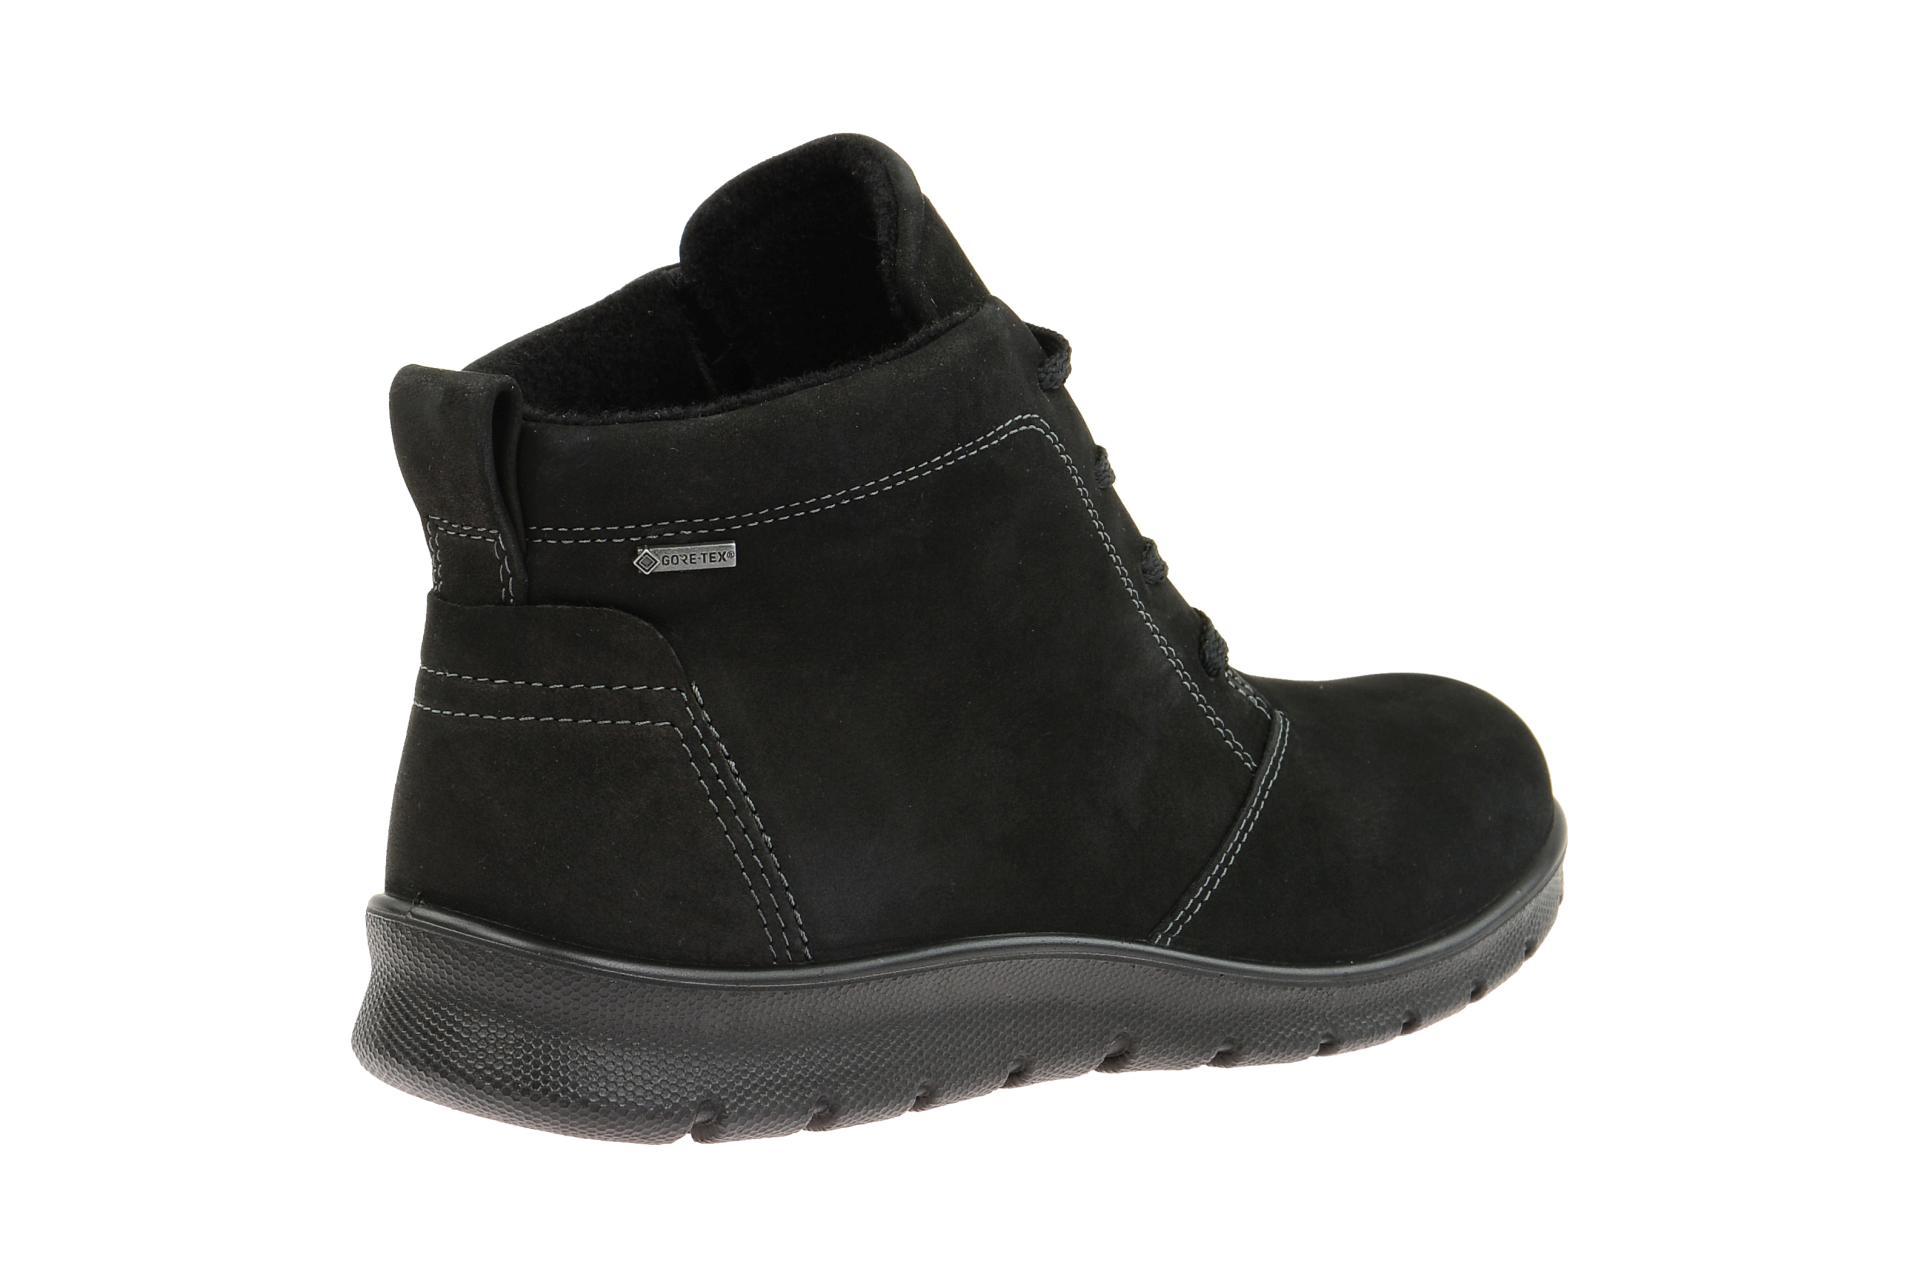 8bbcaa374cb4d8 Ecco Schuhe BABETT BOOT schwarz Damen Stiefeletten Winterstiefelette  21558302001